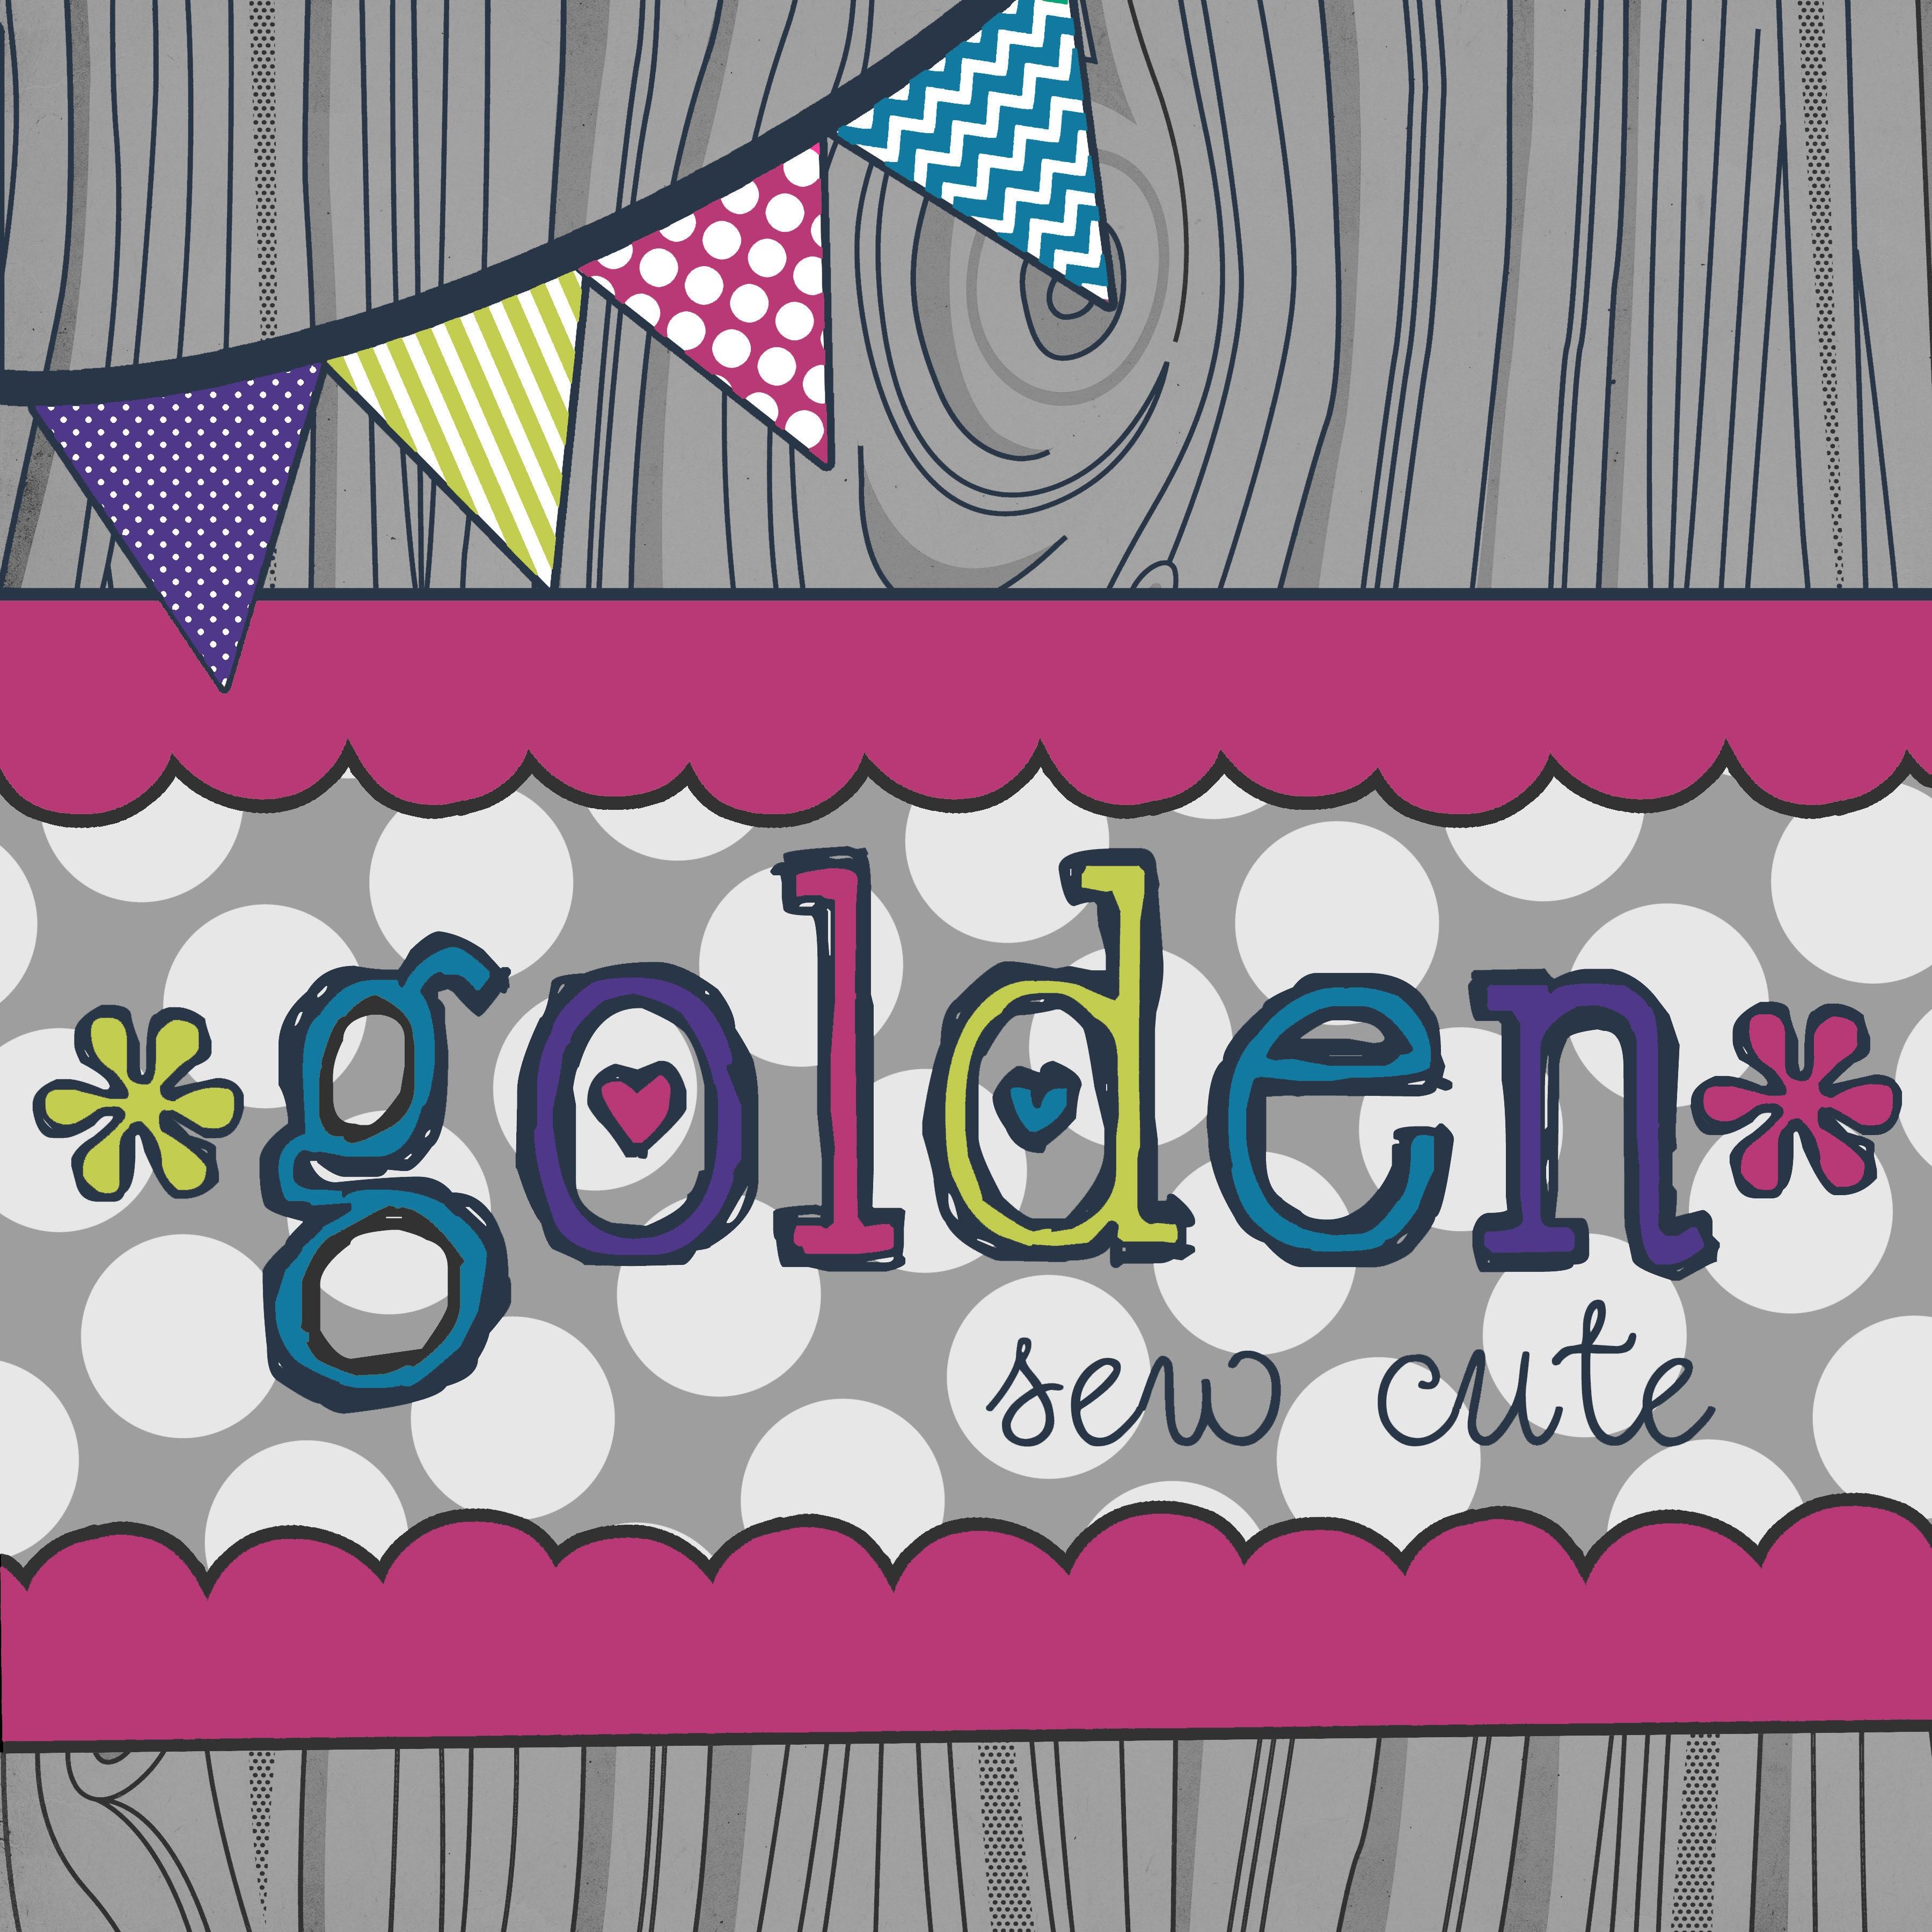 goldenSewCute